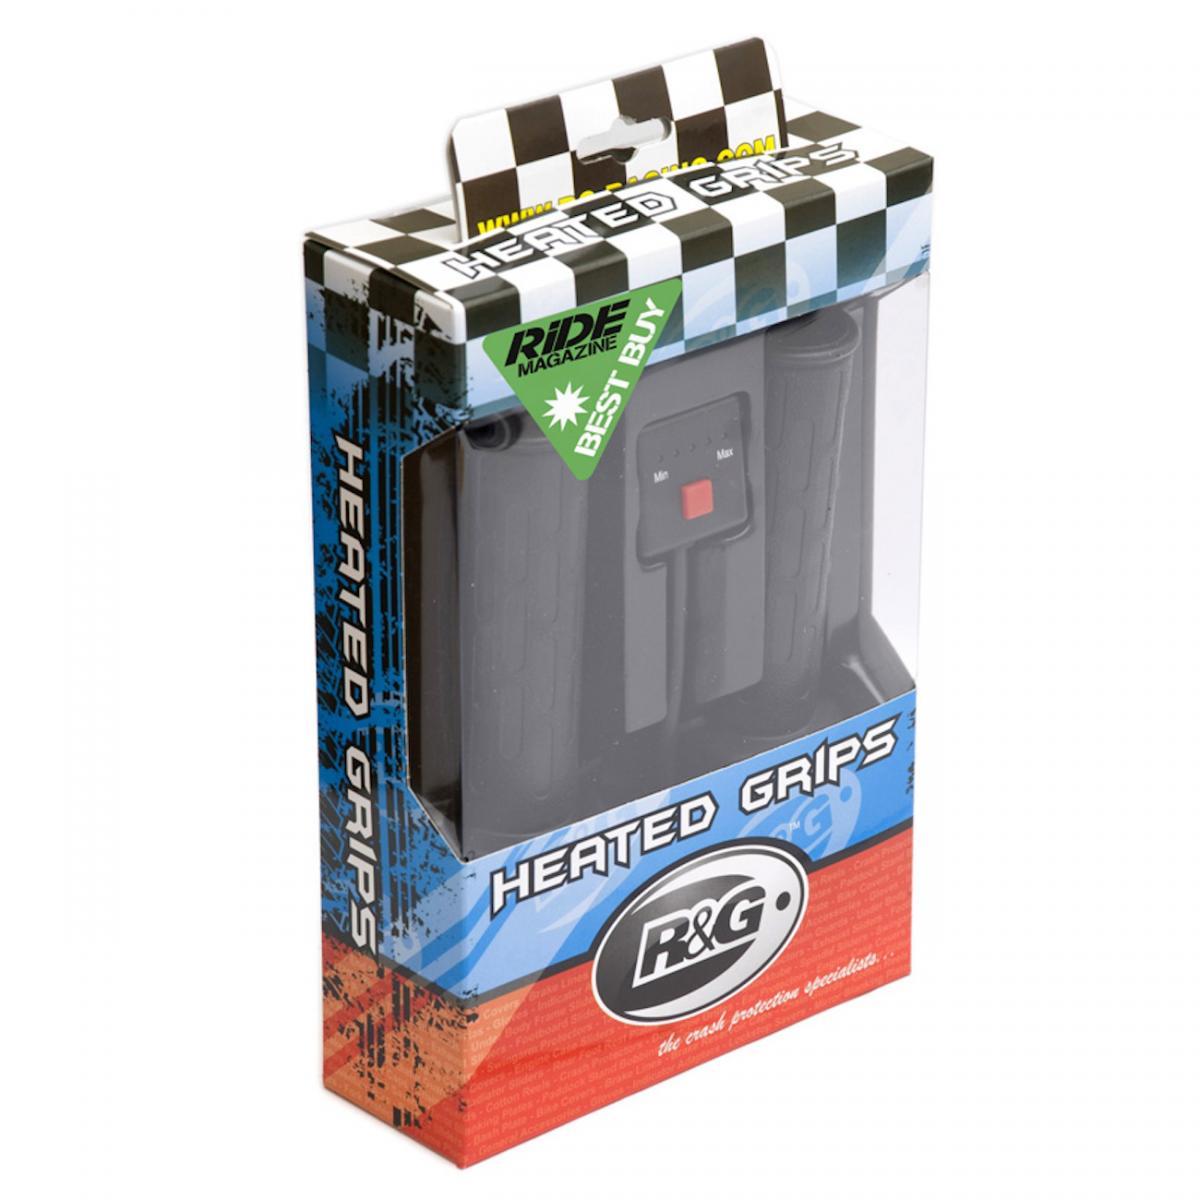 R&G Racing hot grips